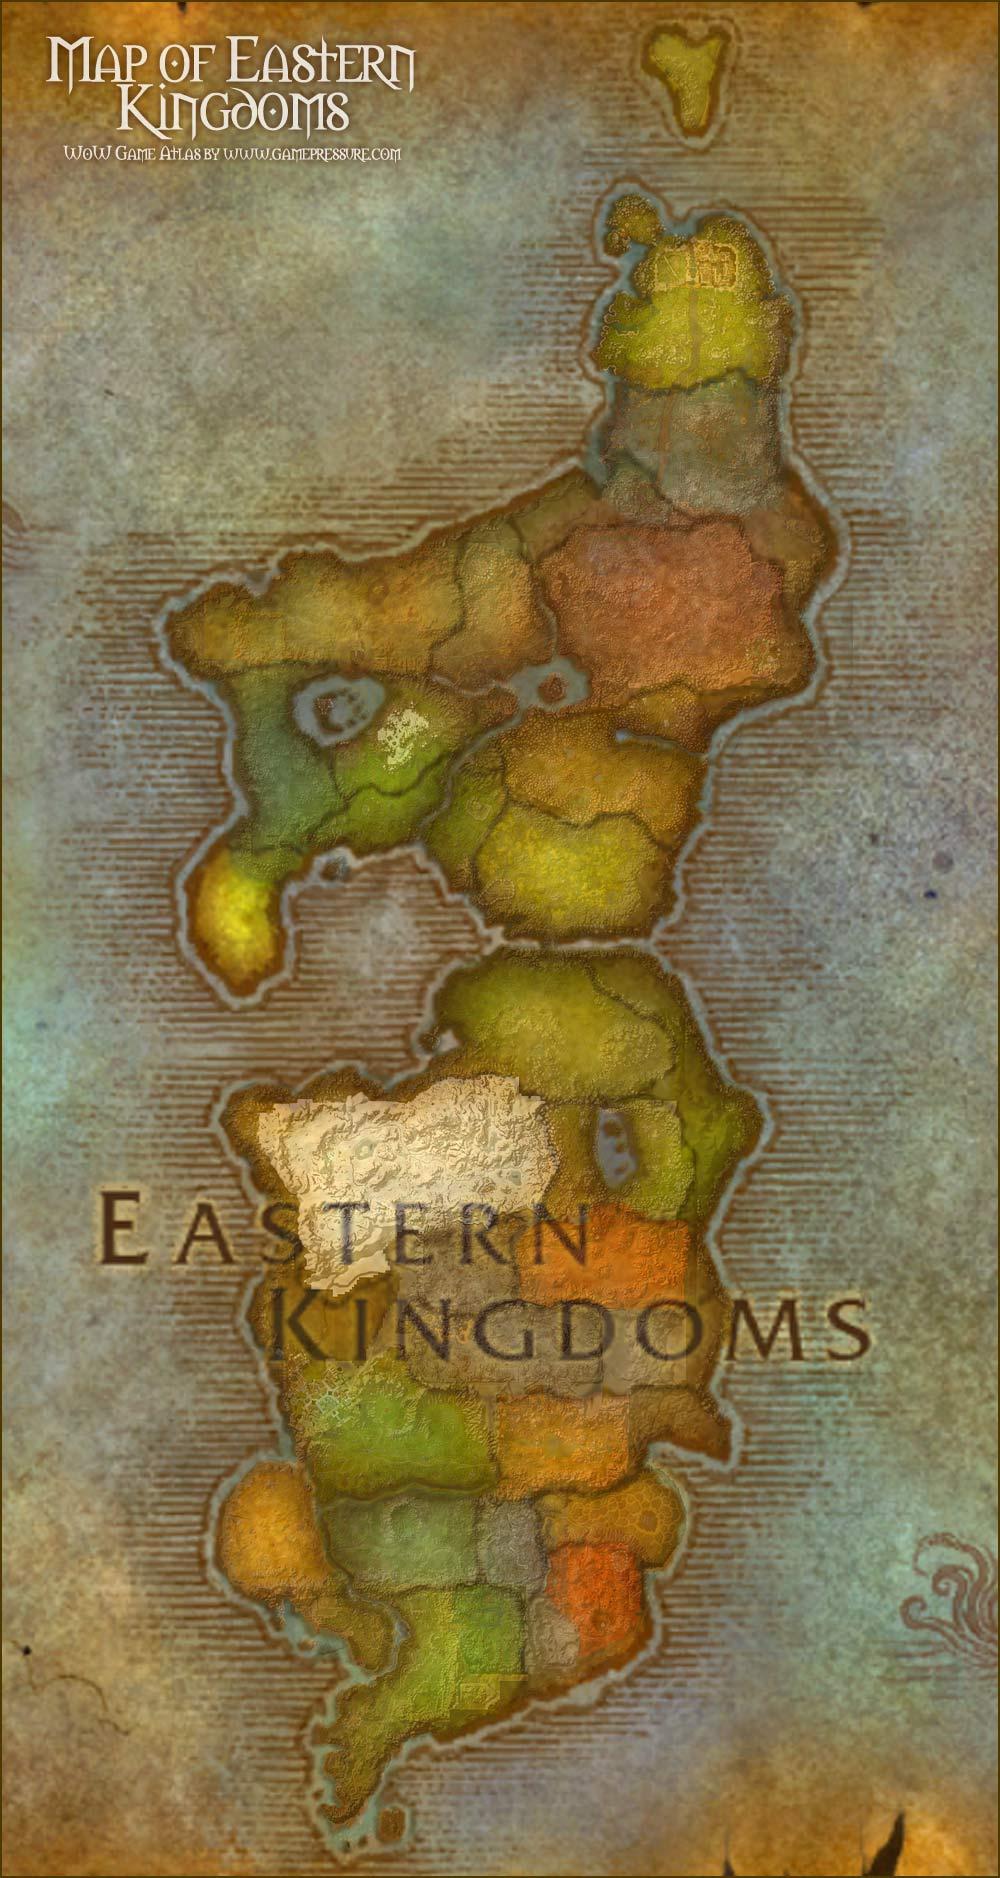 Eastern Kingdoms Map : eastern, kingdoms, Eastern, Kingdoms, World, Warcraft